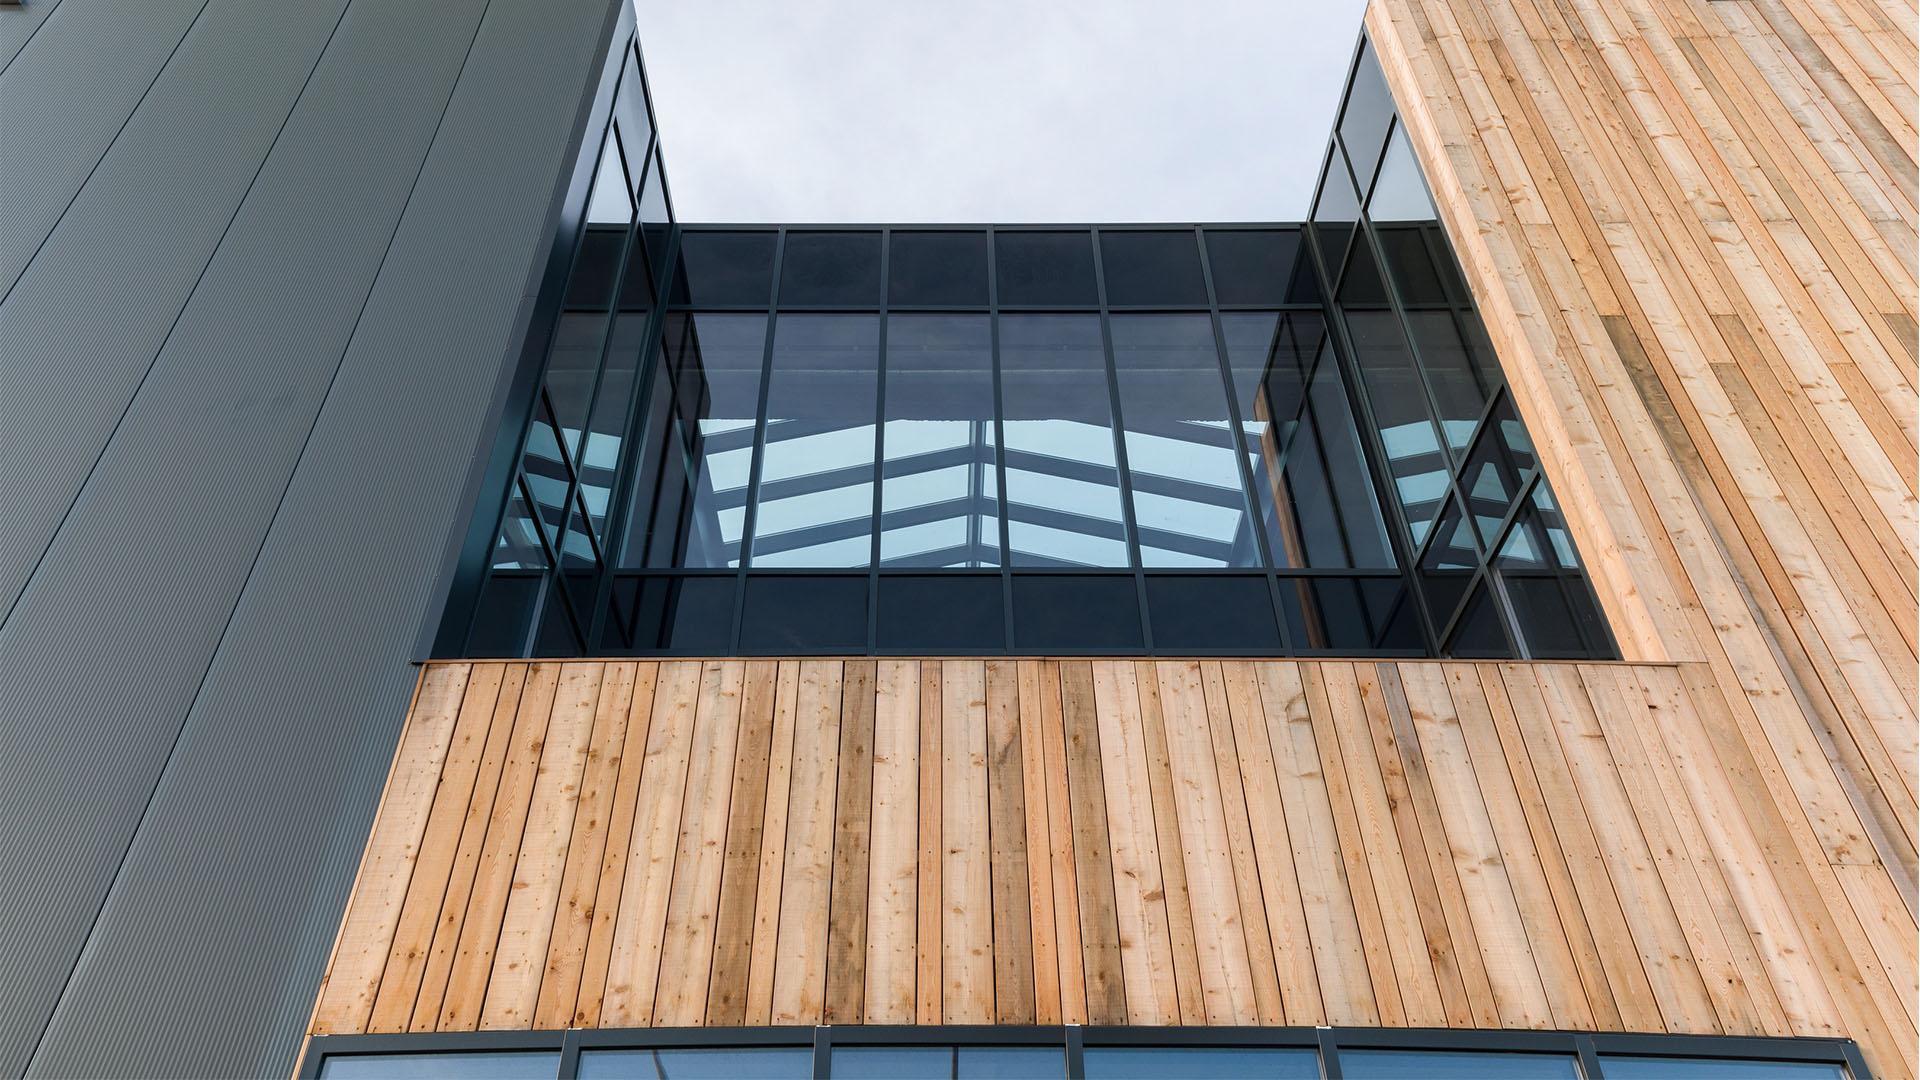 Bedrijfspand Etikon Nederland balkon nieuwbouw | Wijnja Groep